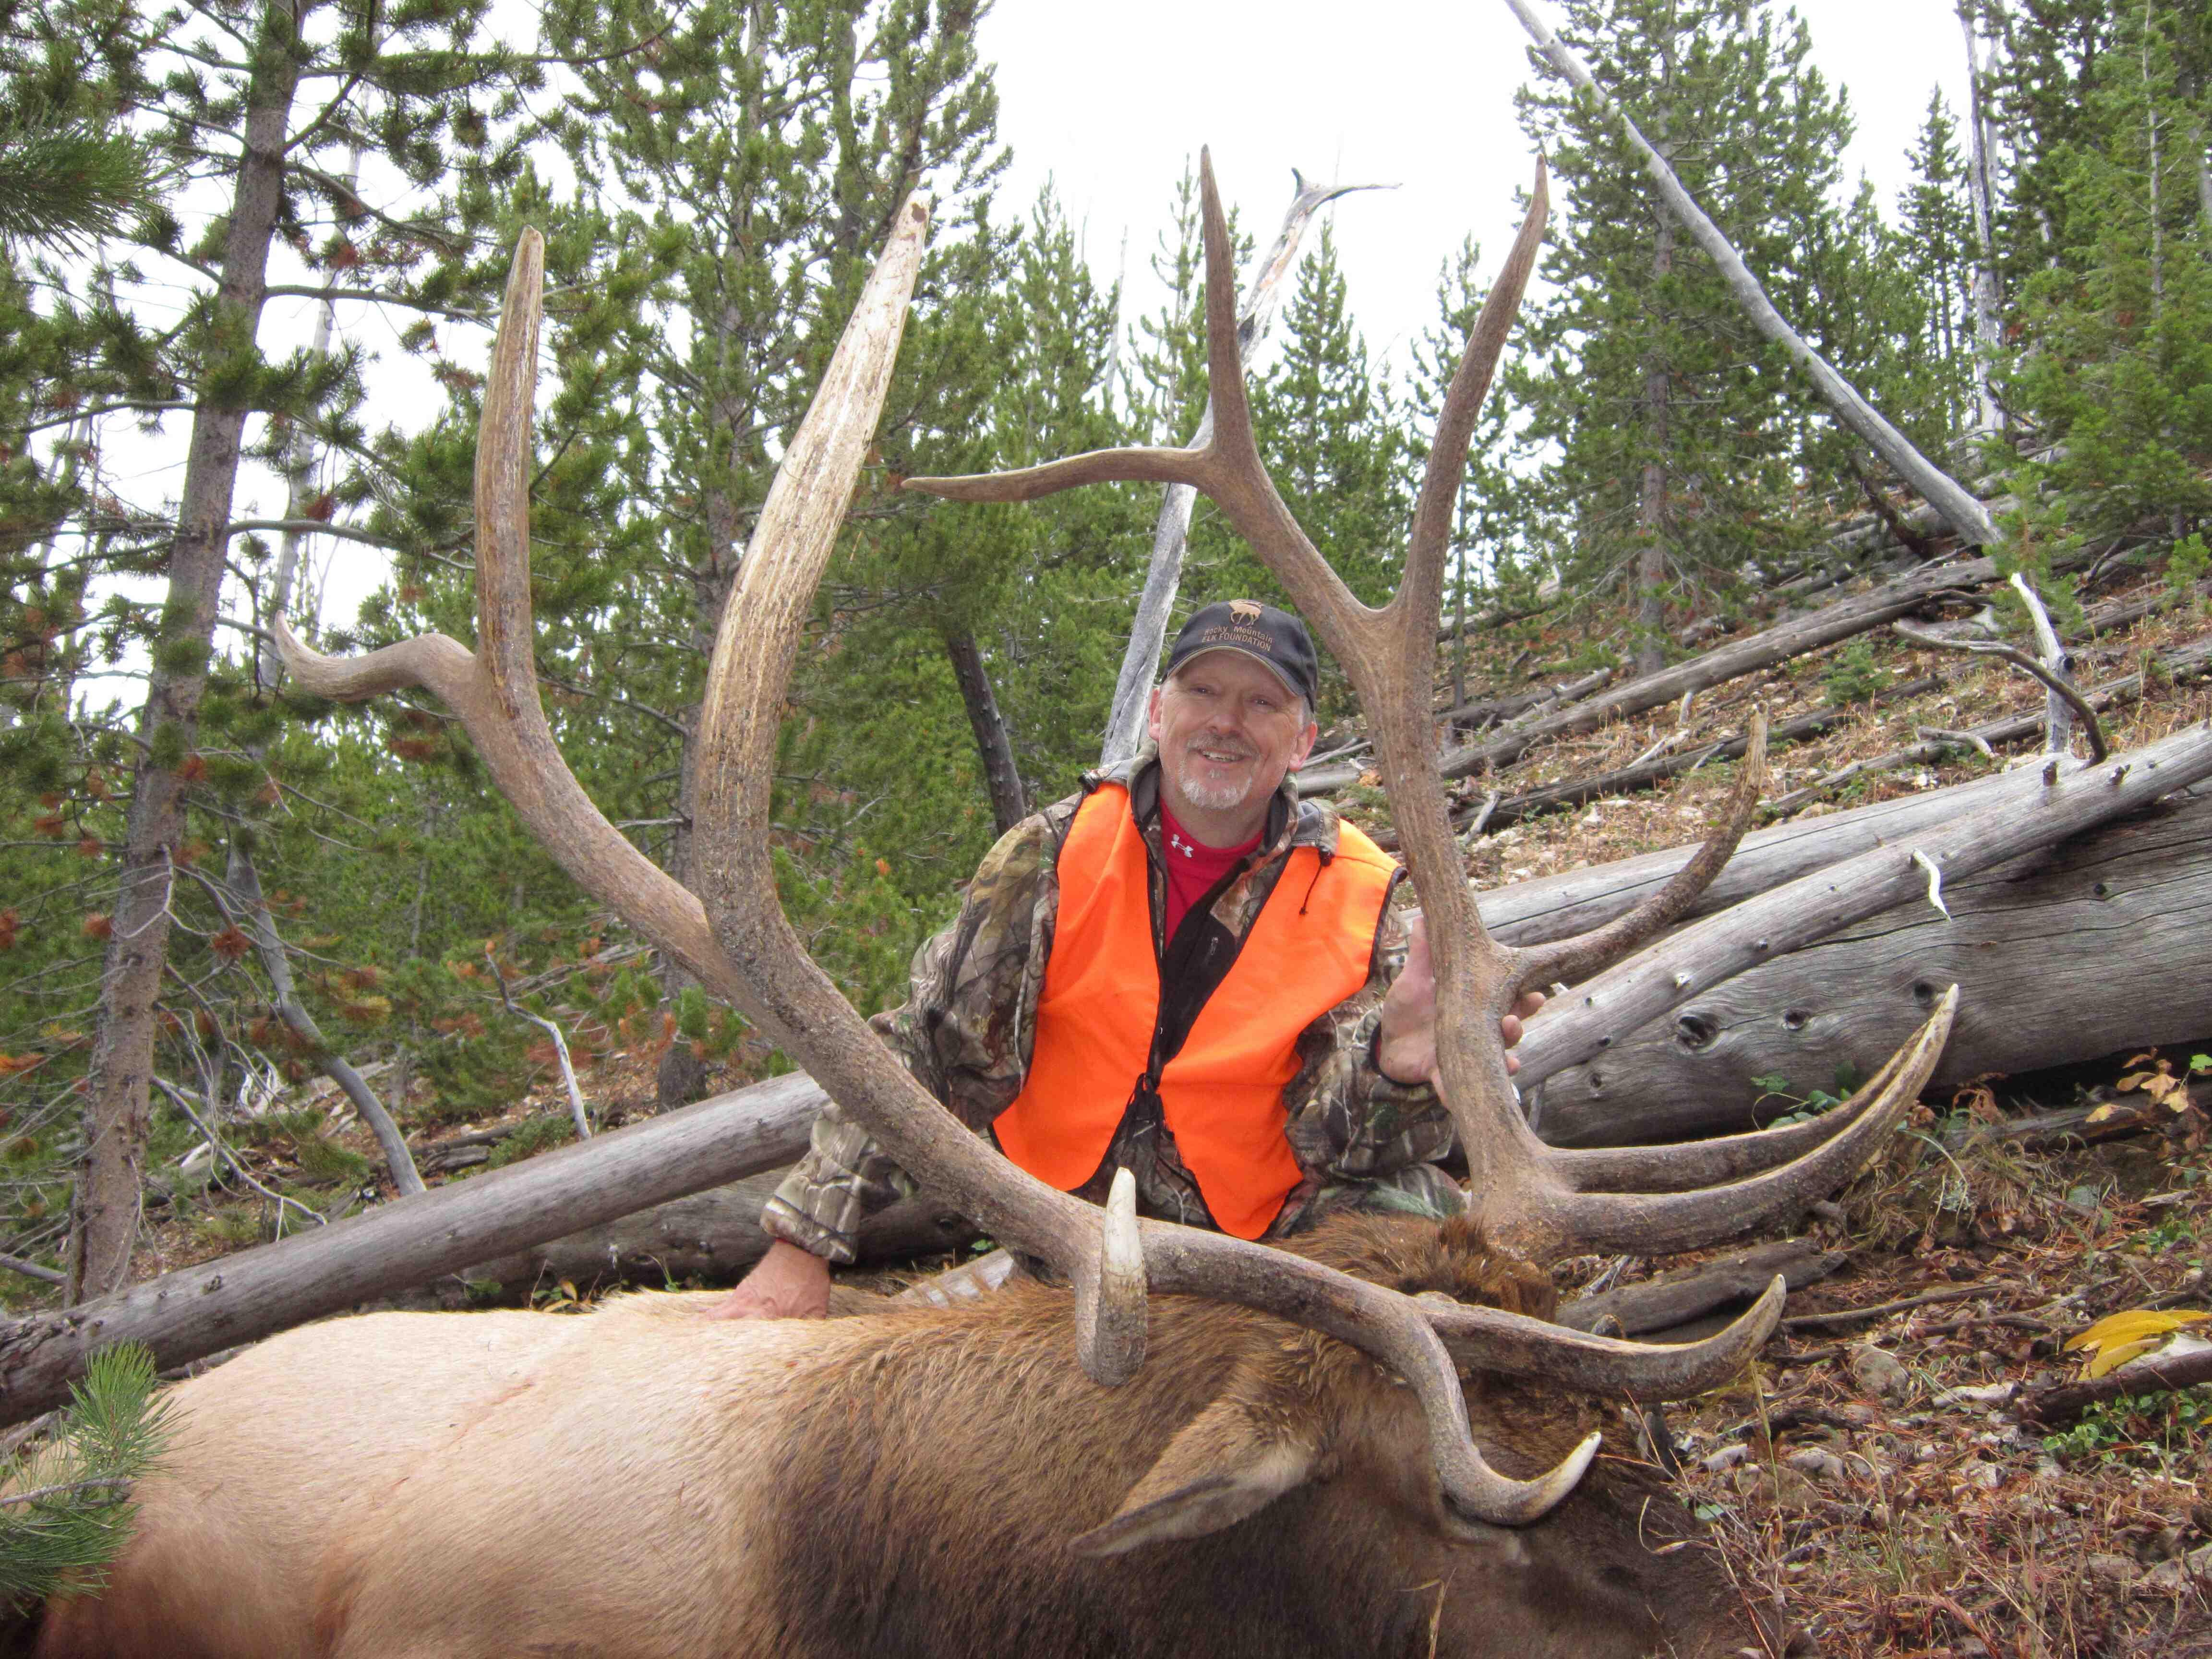 Outdoor adventures worldwide wyoming elk area 38 39 for Fishing license wyoming